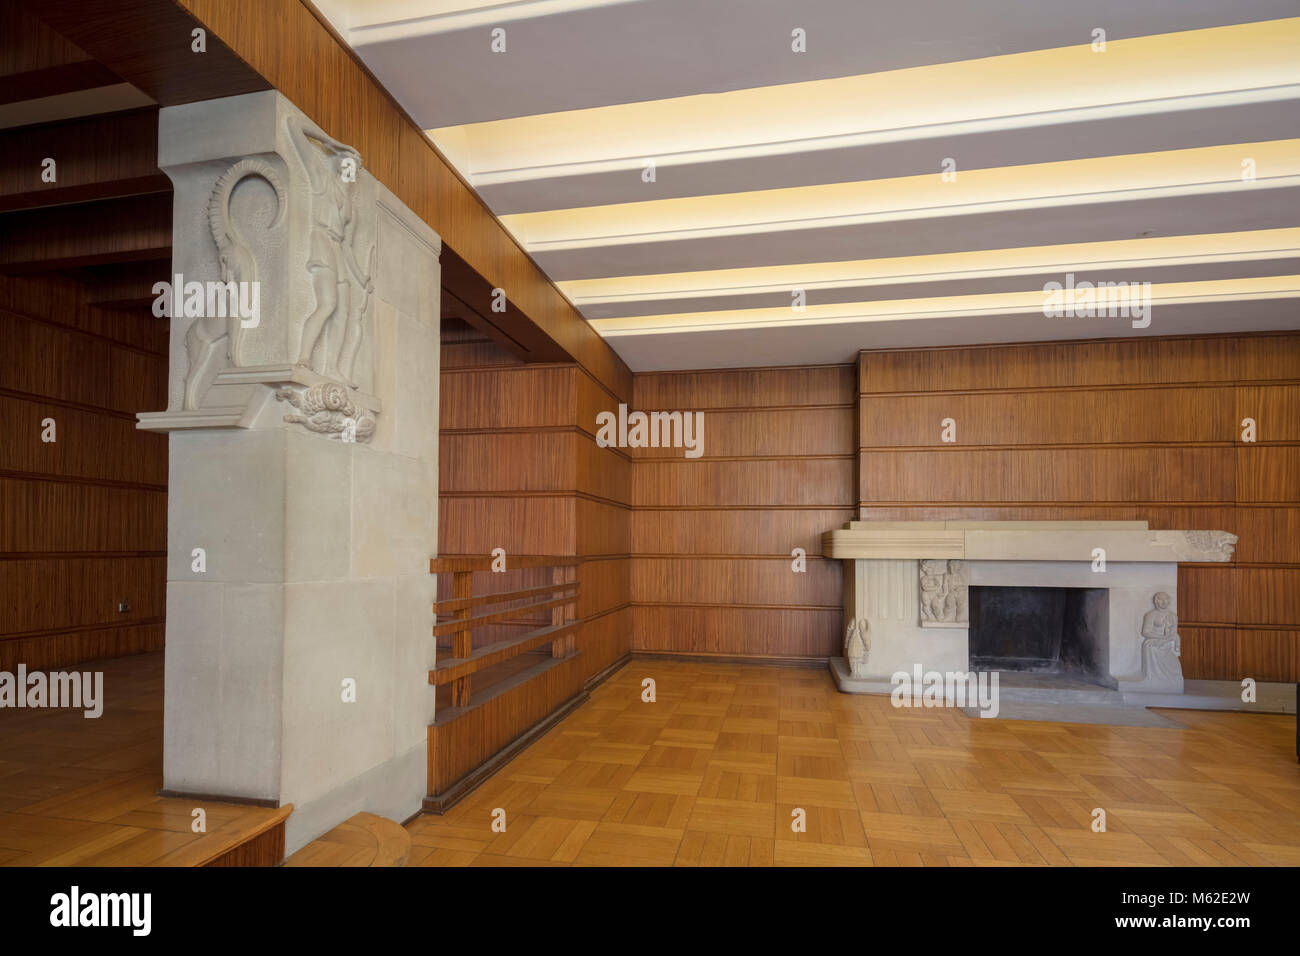 Siegfried Wagner House, Bayreuth, Bavaria, Germany - Stock Image